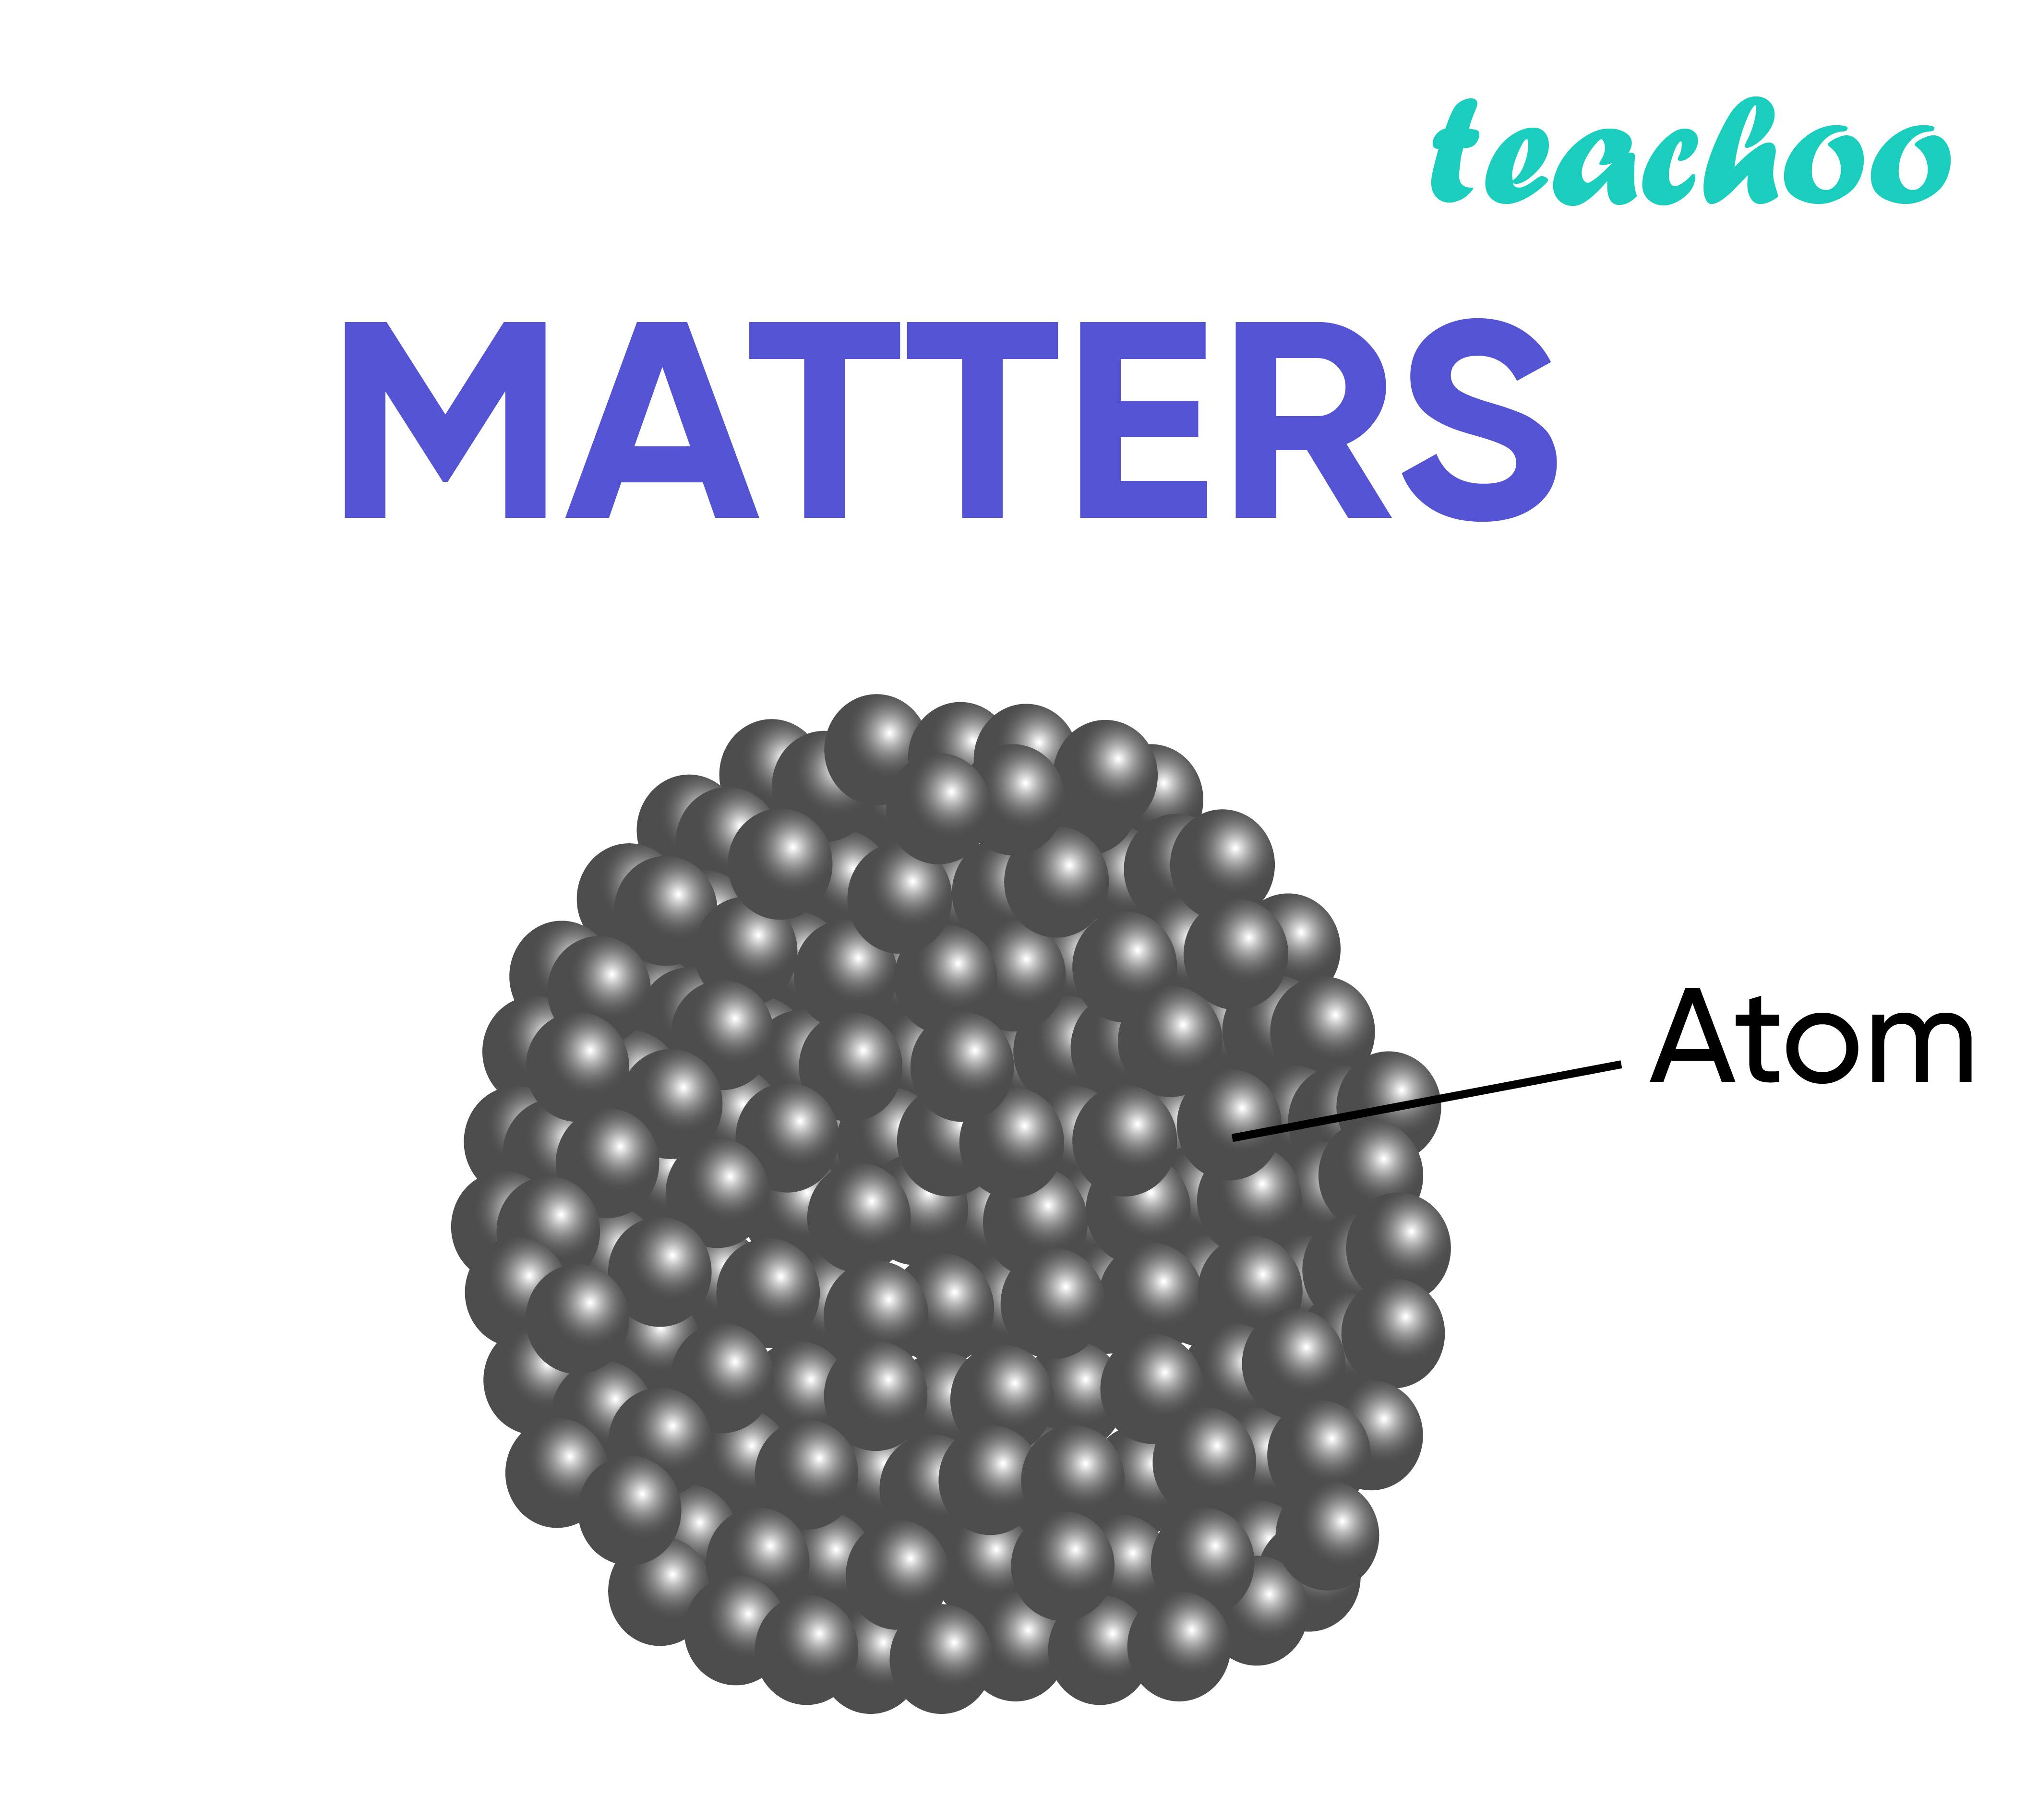 Dalton Atomic Theory (Matters) - Teachoo-01.jpg